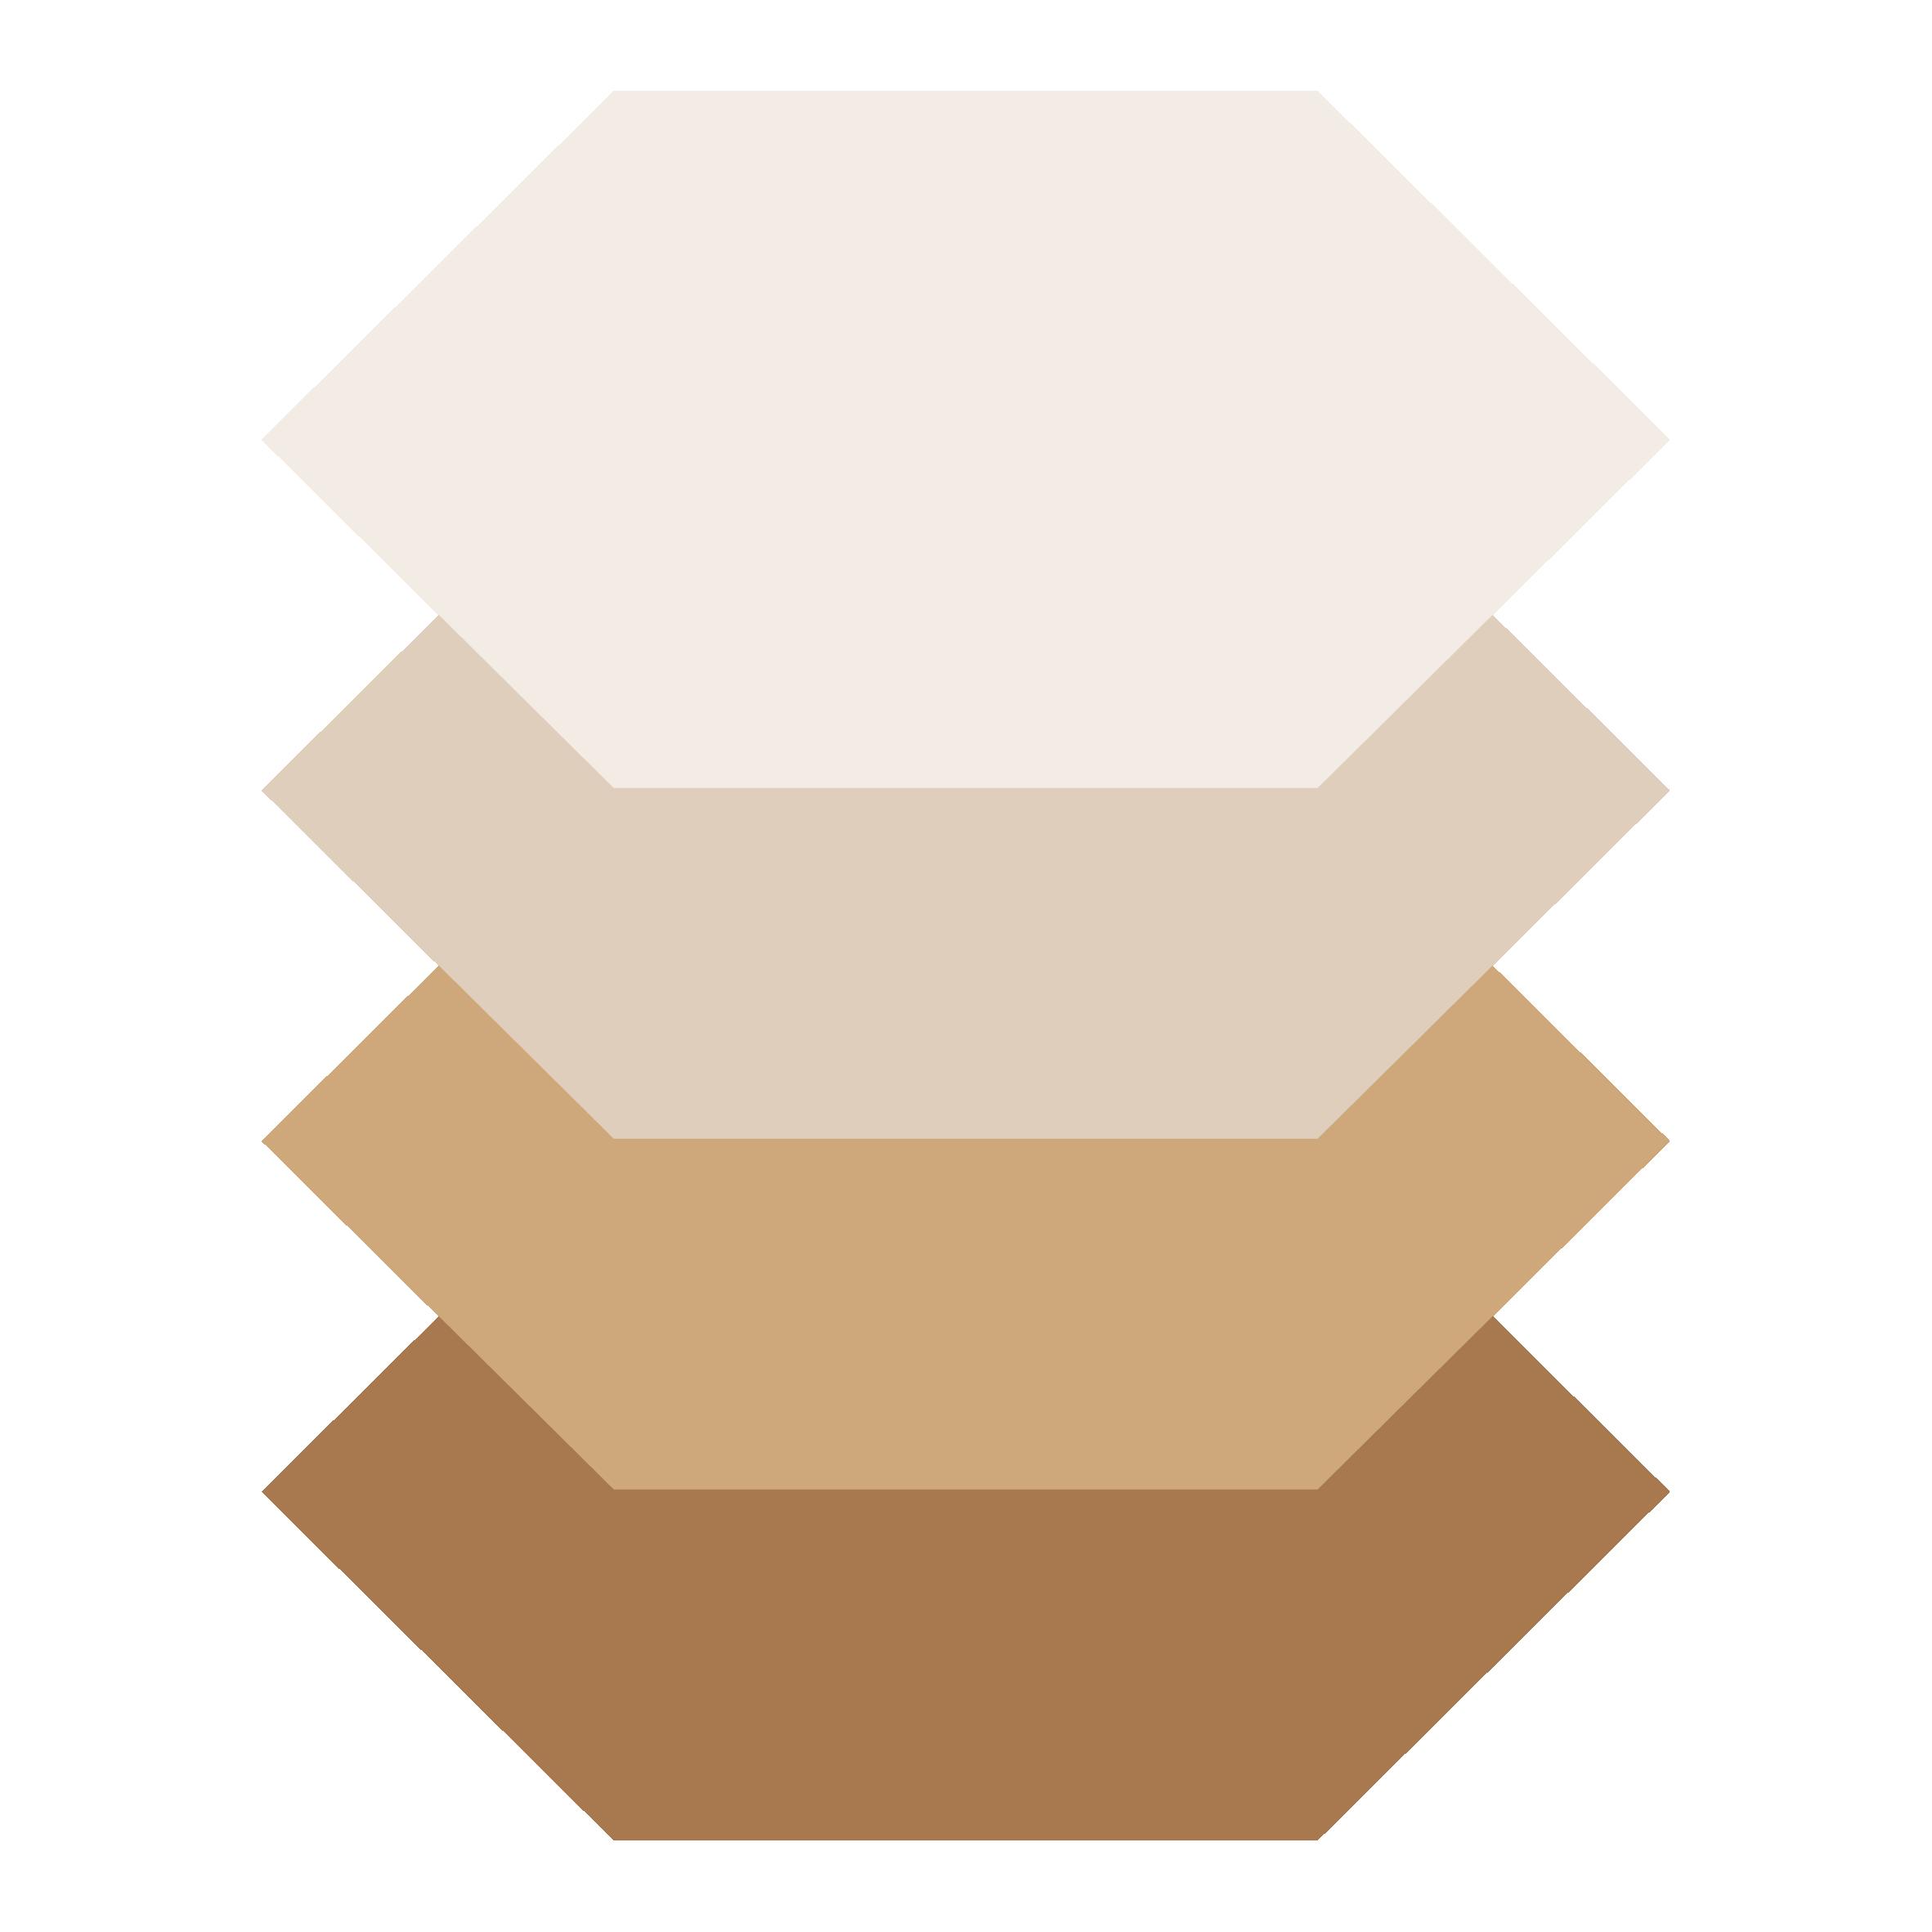 Custom client environment icon